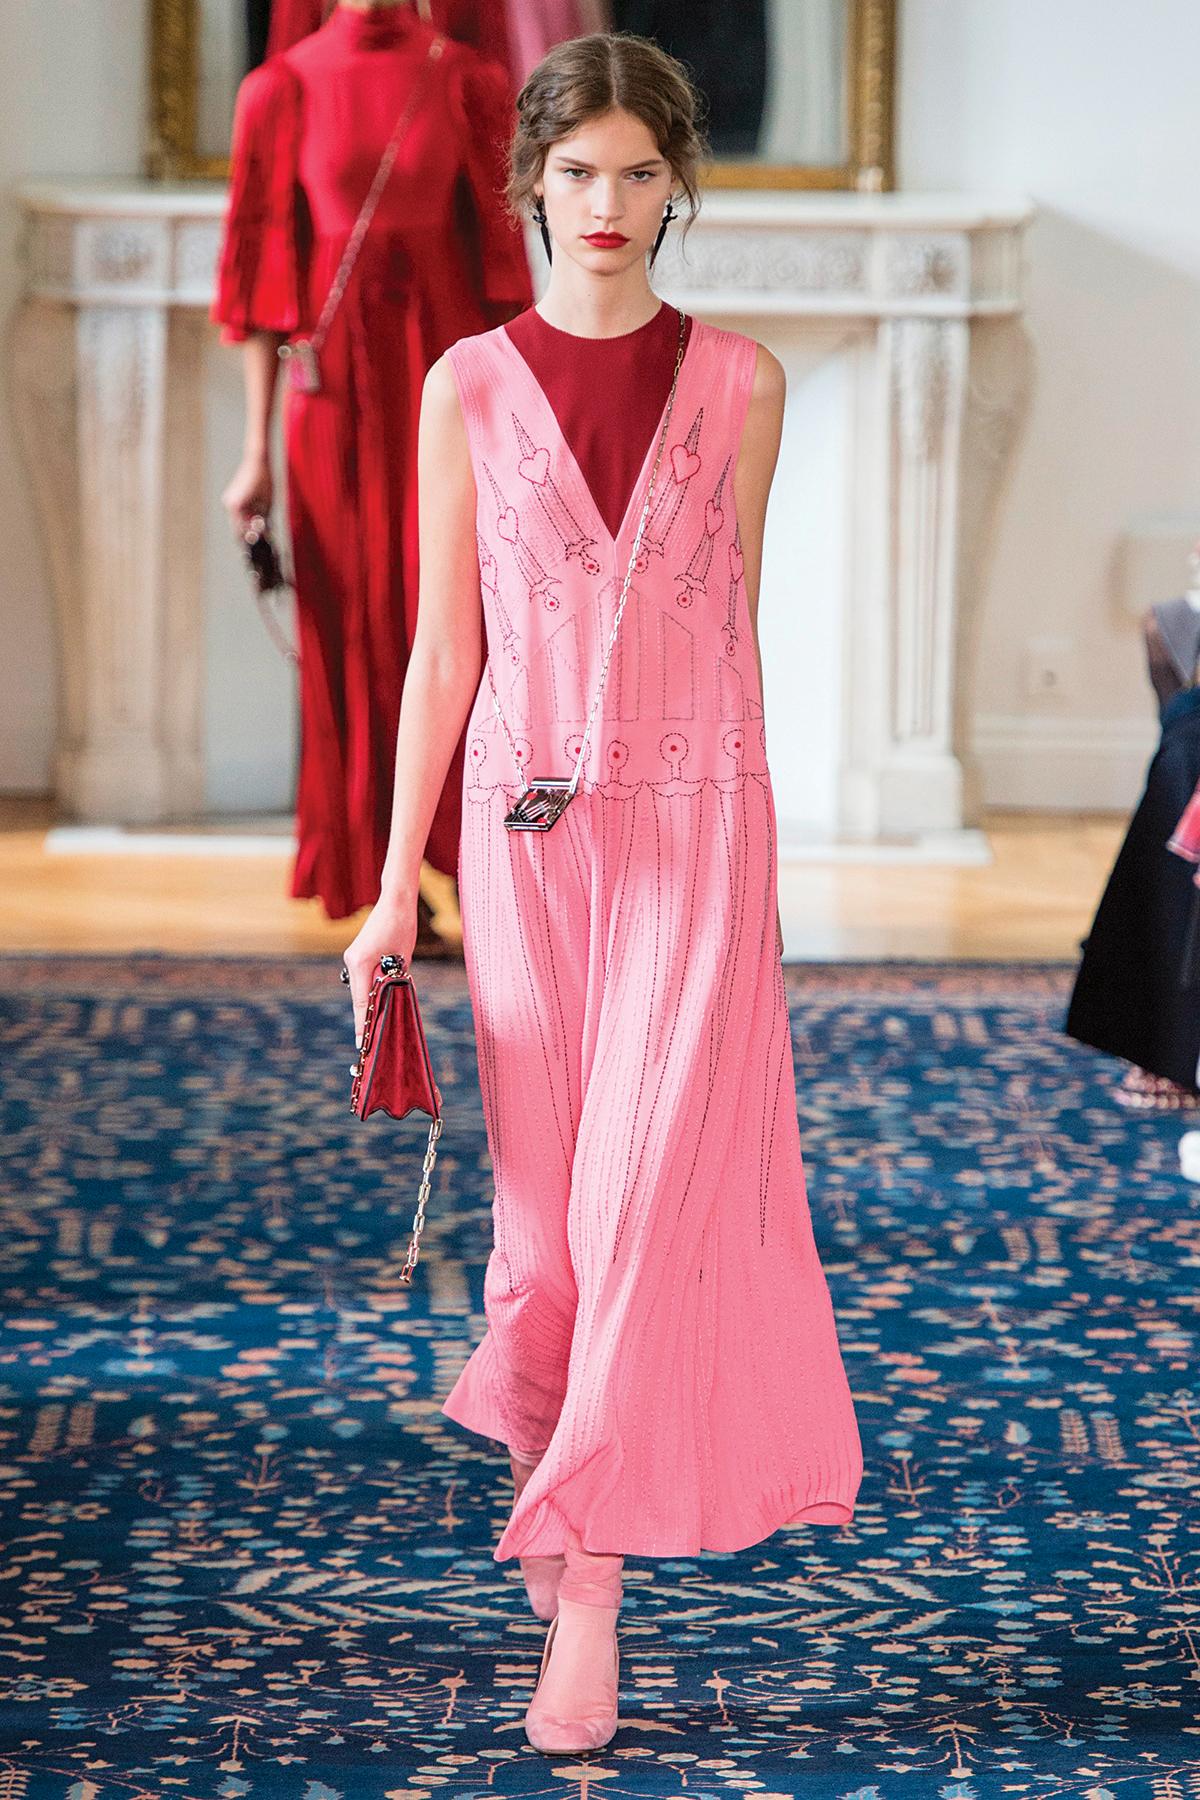 pretty pink accessories